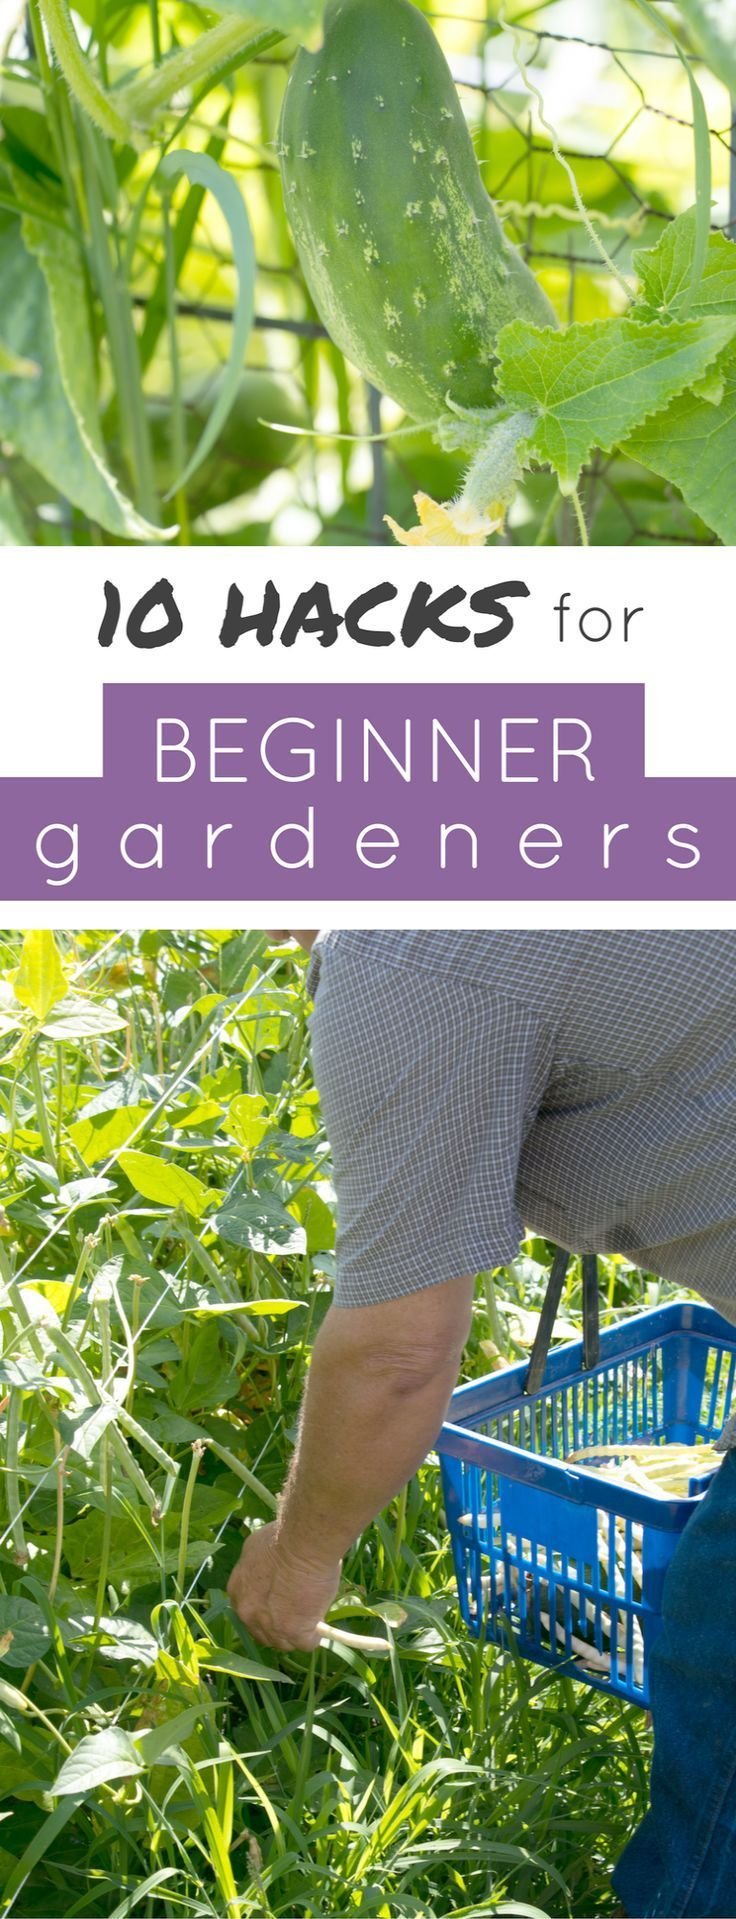 Gardening Tools Perth like Best Vegetable Gardening Books ...